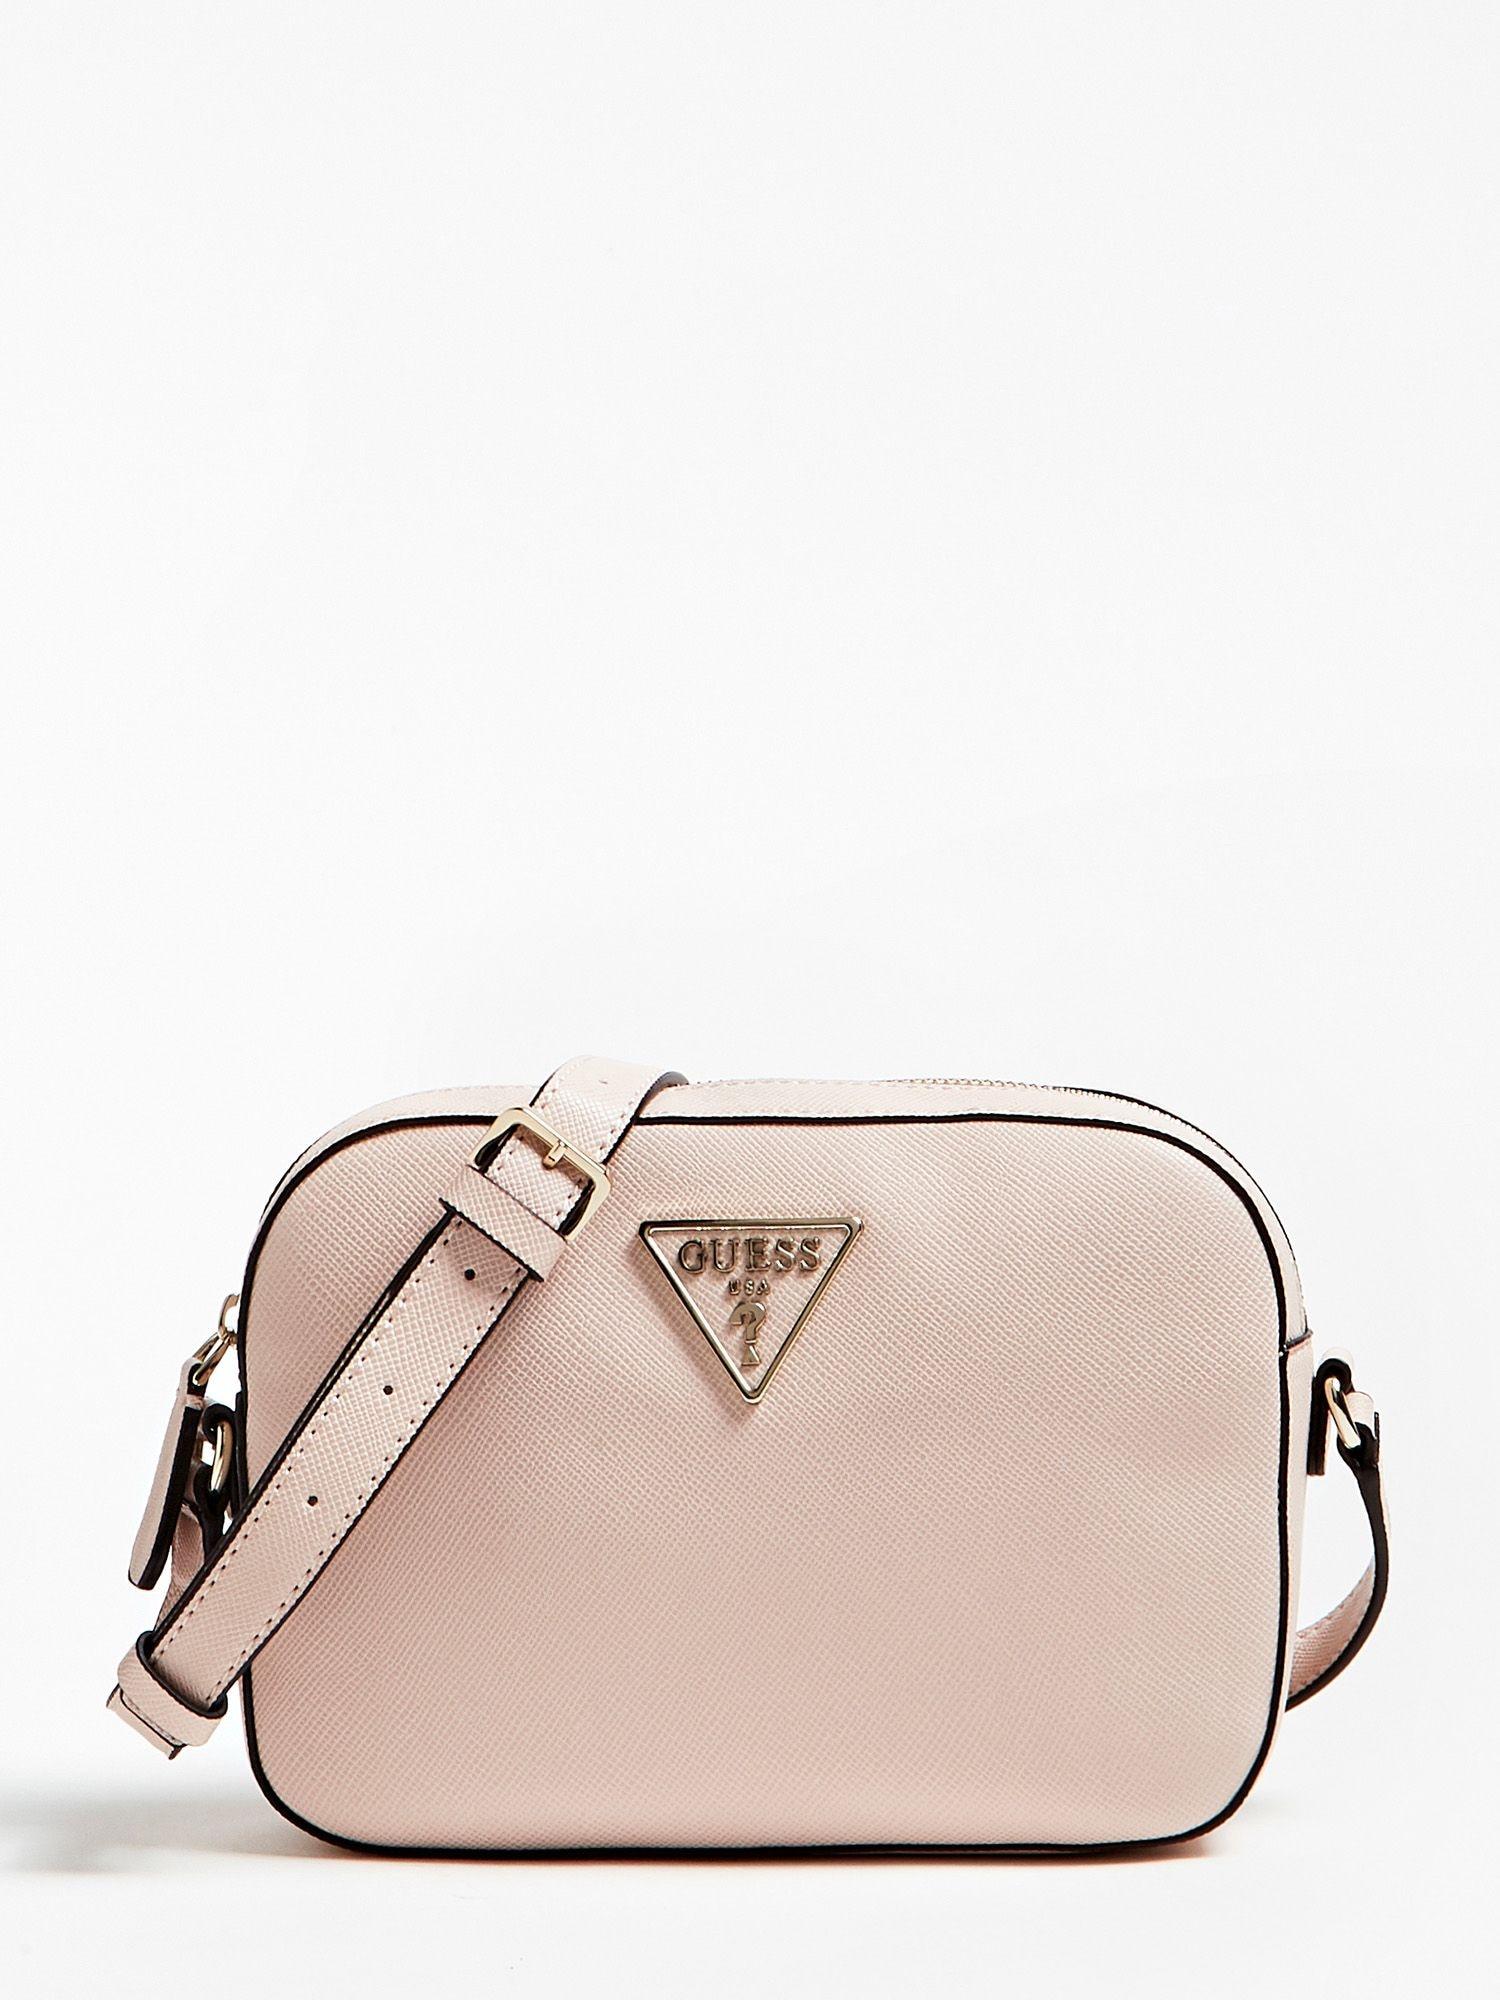 Umhängetasche 'Carys' | Taschen > Handtaschen > Umhängetaschen | Guess